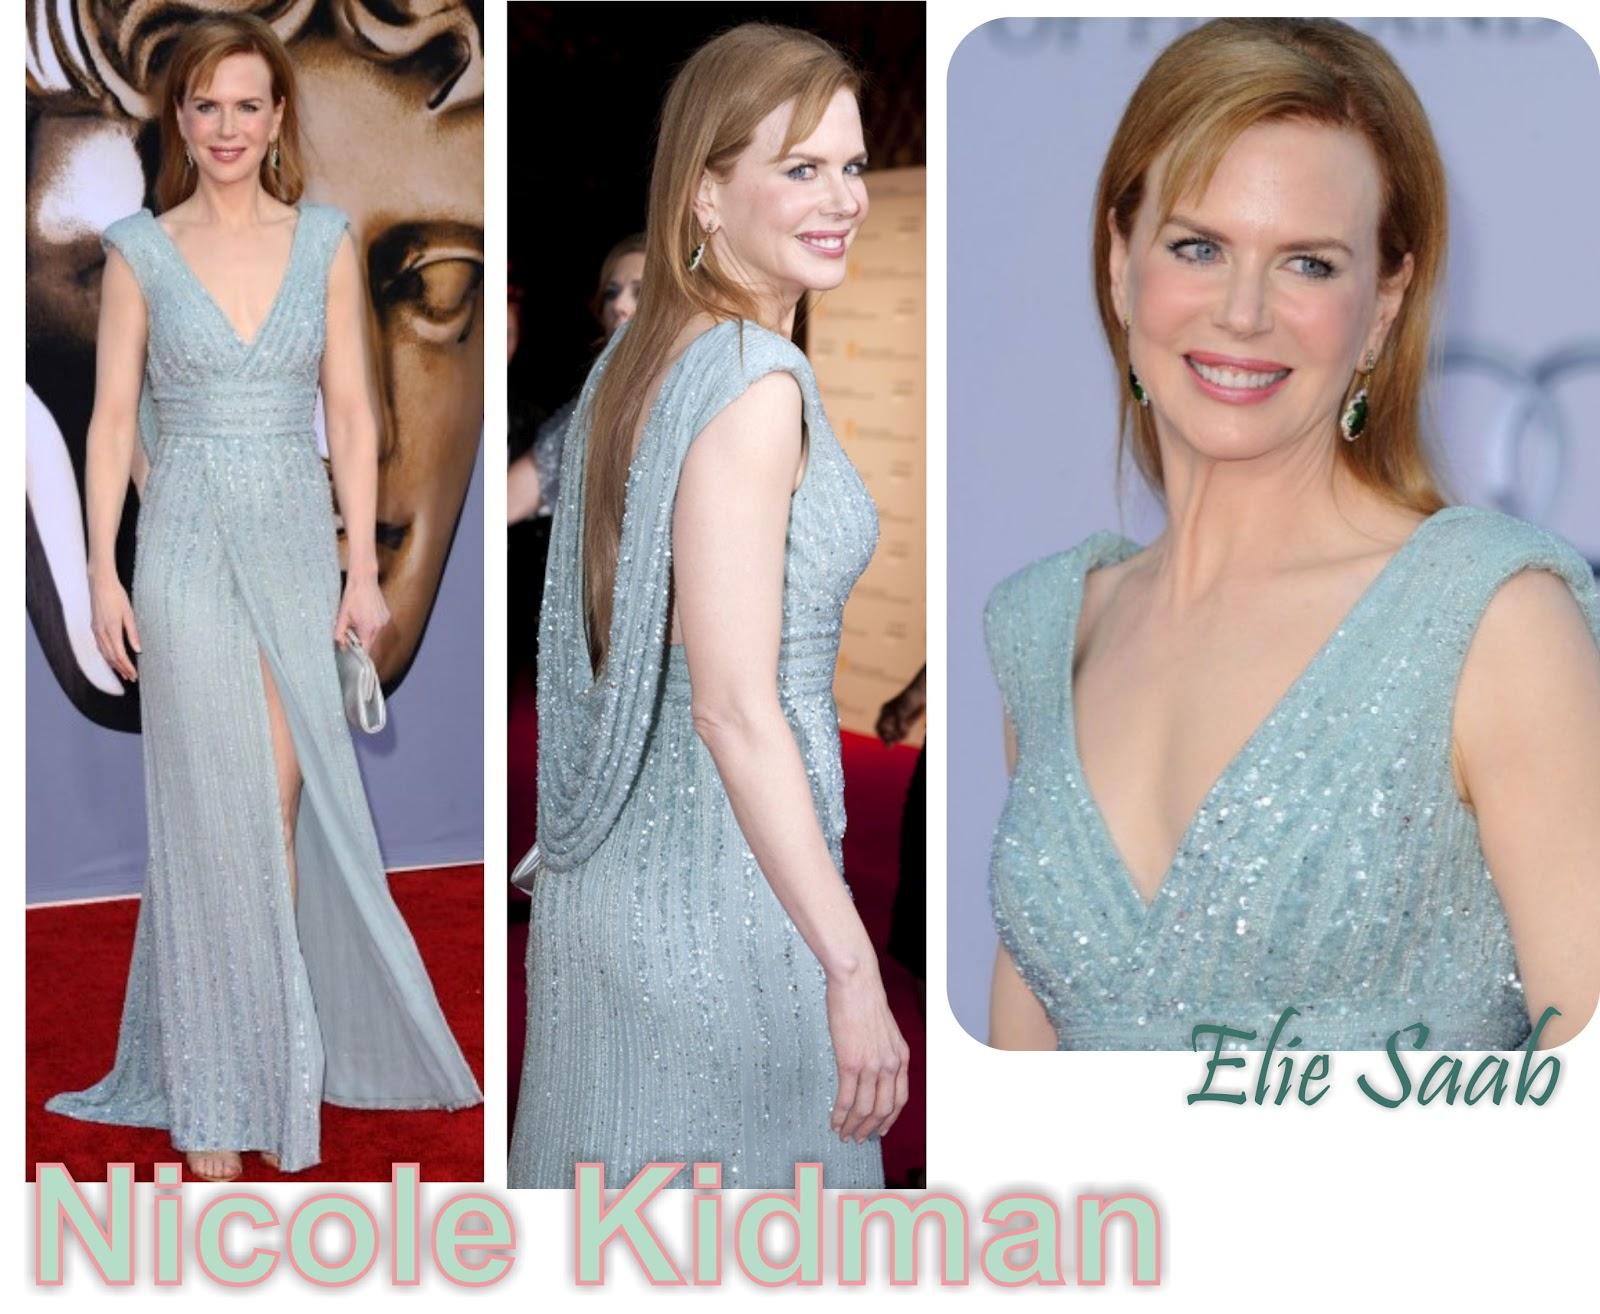 http://2.bp.blogspot.com/-sueMb9Zlck8/T3nF8_iK2rI/AAAAAAAACGY/Ou2o4uSR9yk/s1600/BAFTA+2011++Nicole+Kidman.jpg